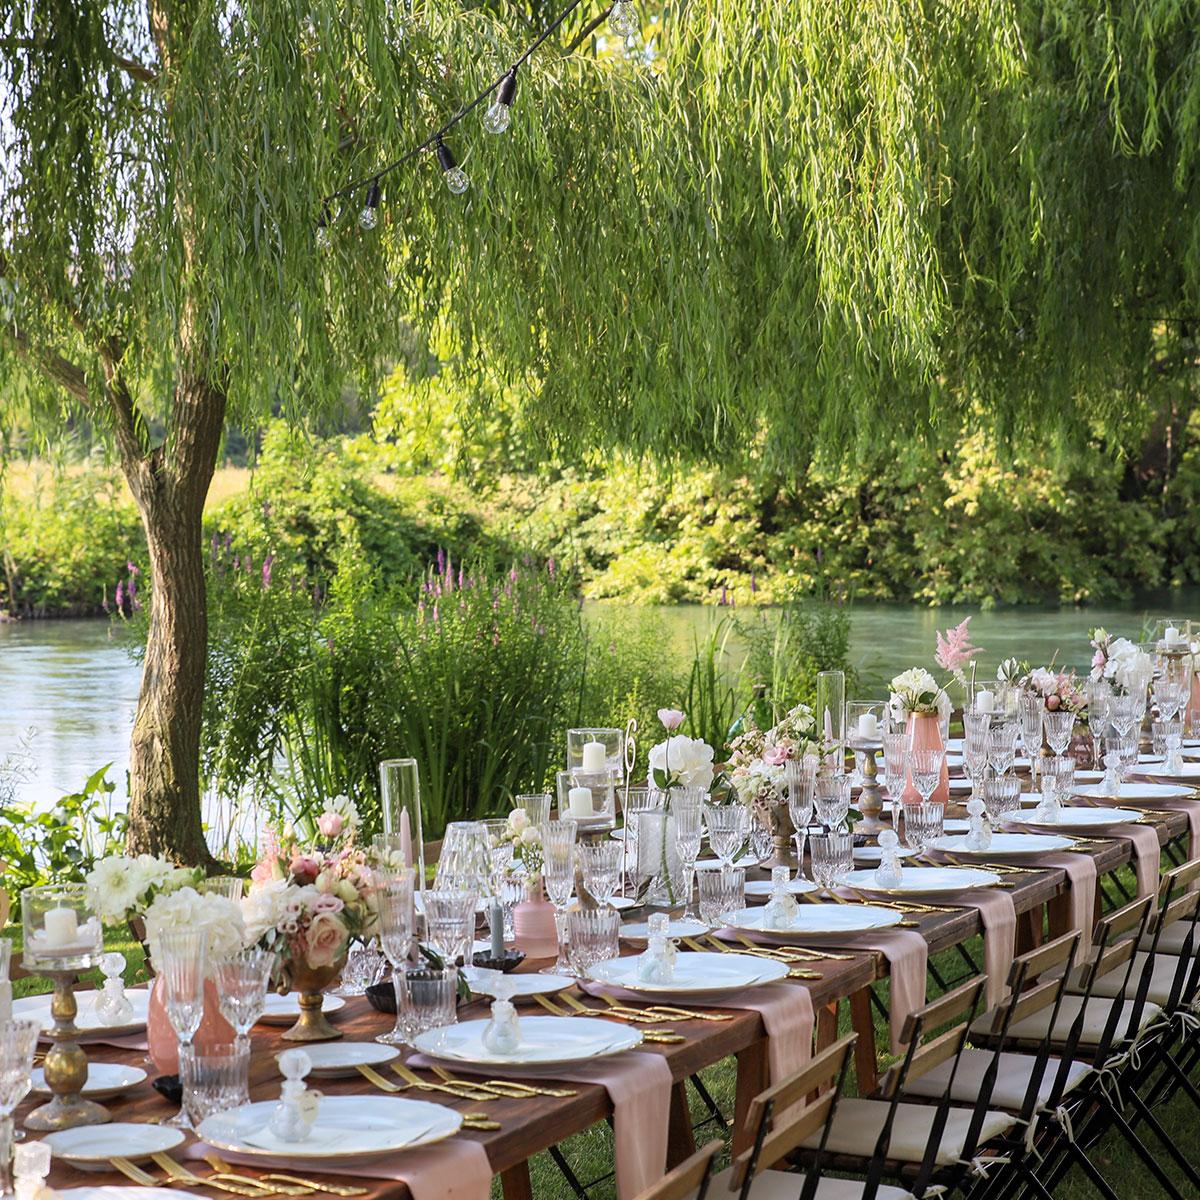 Matrimonio su lago | Negriricevimenti.com